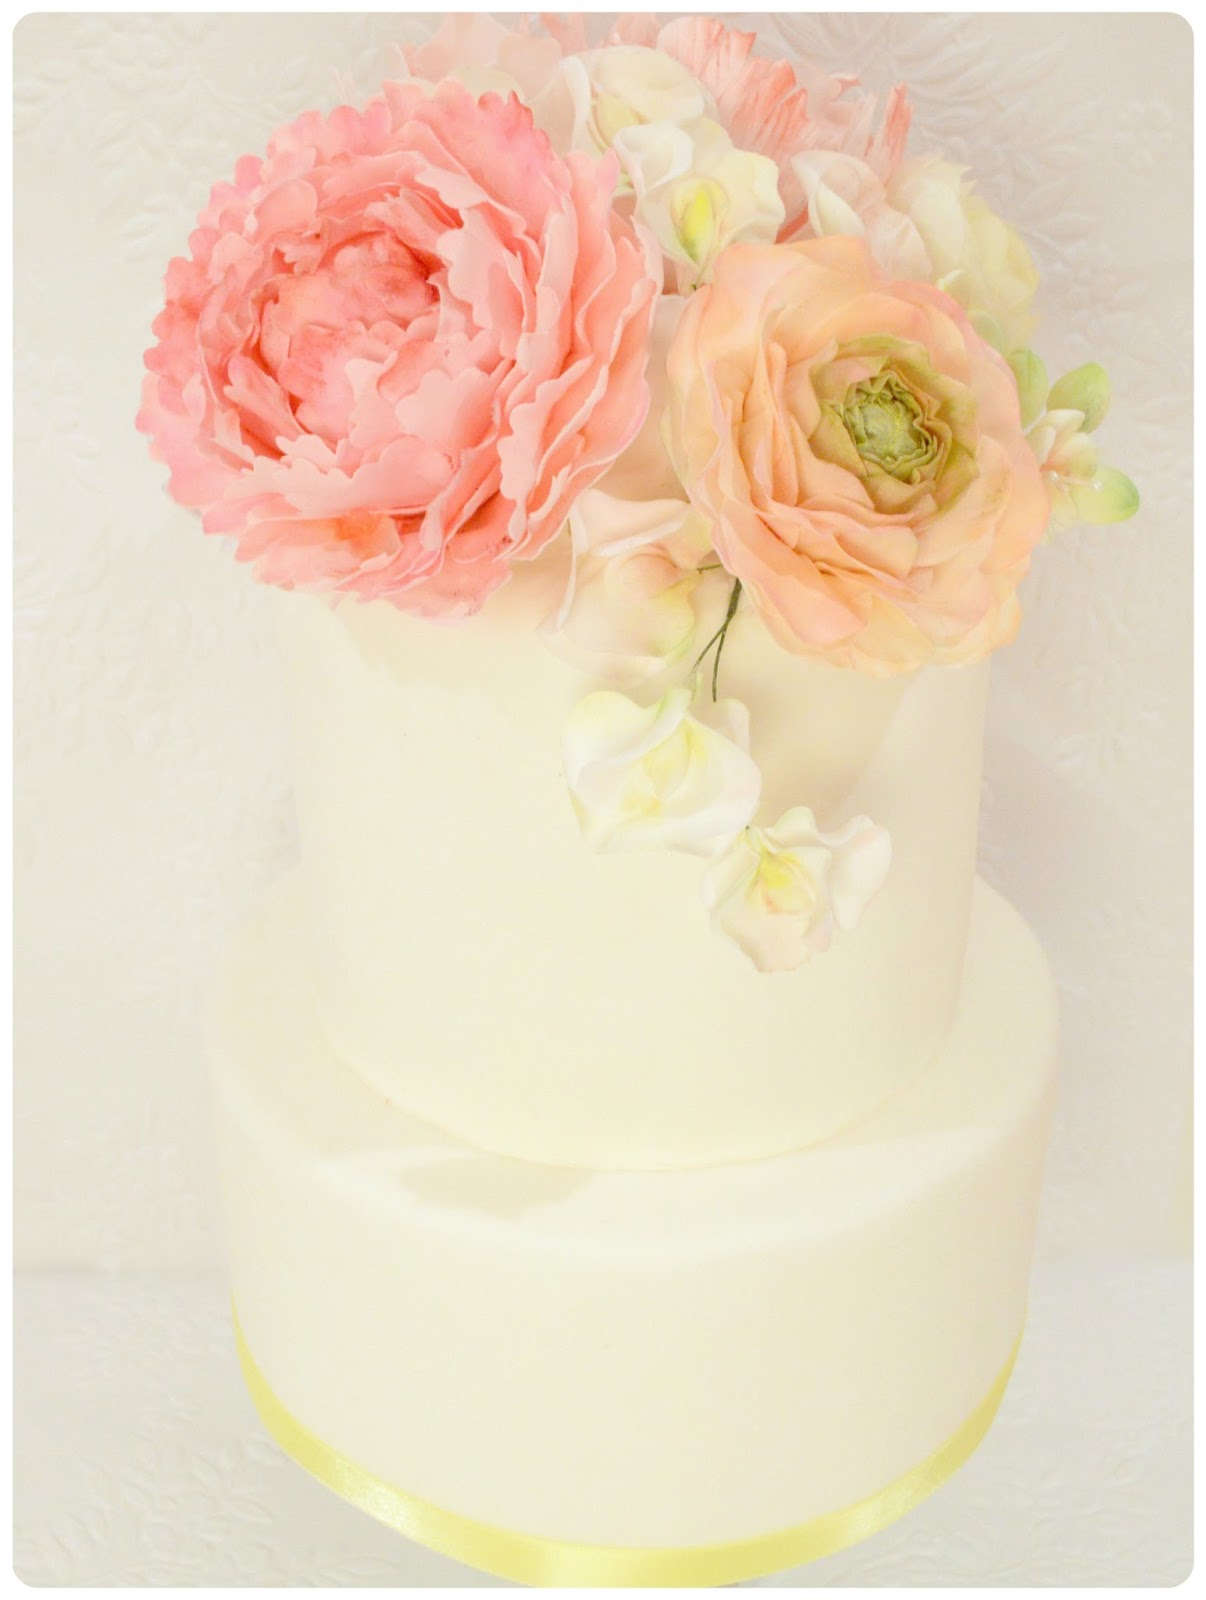 Sugar Peony, Ranunculus and Rose Wedding Cake Cherie Kelly London